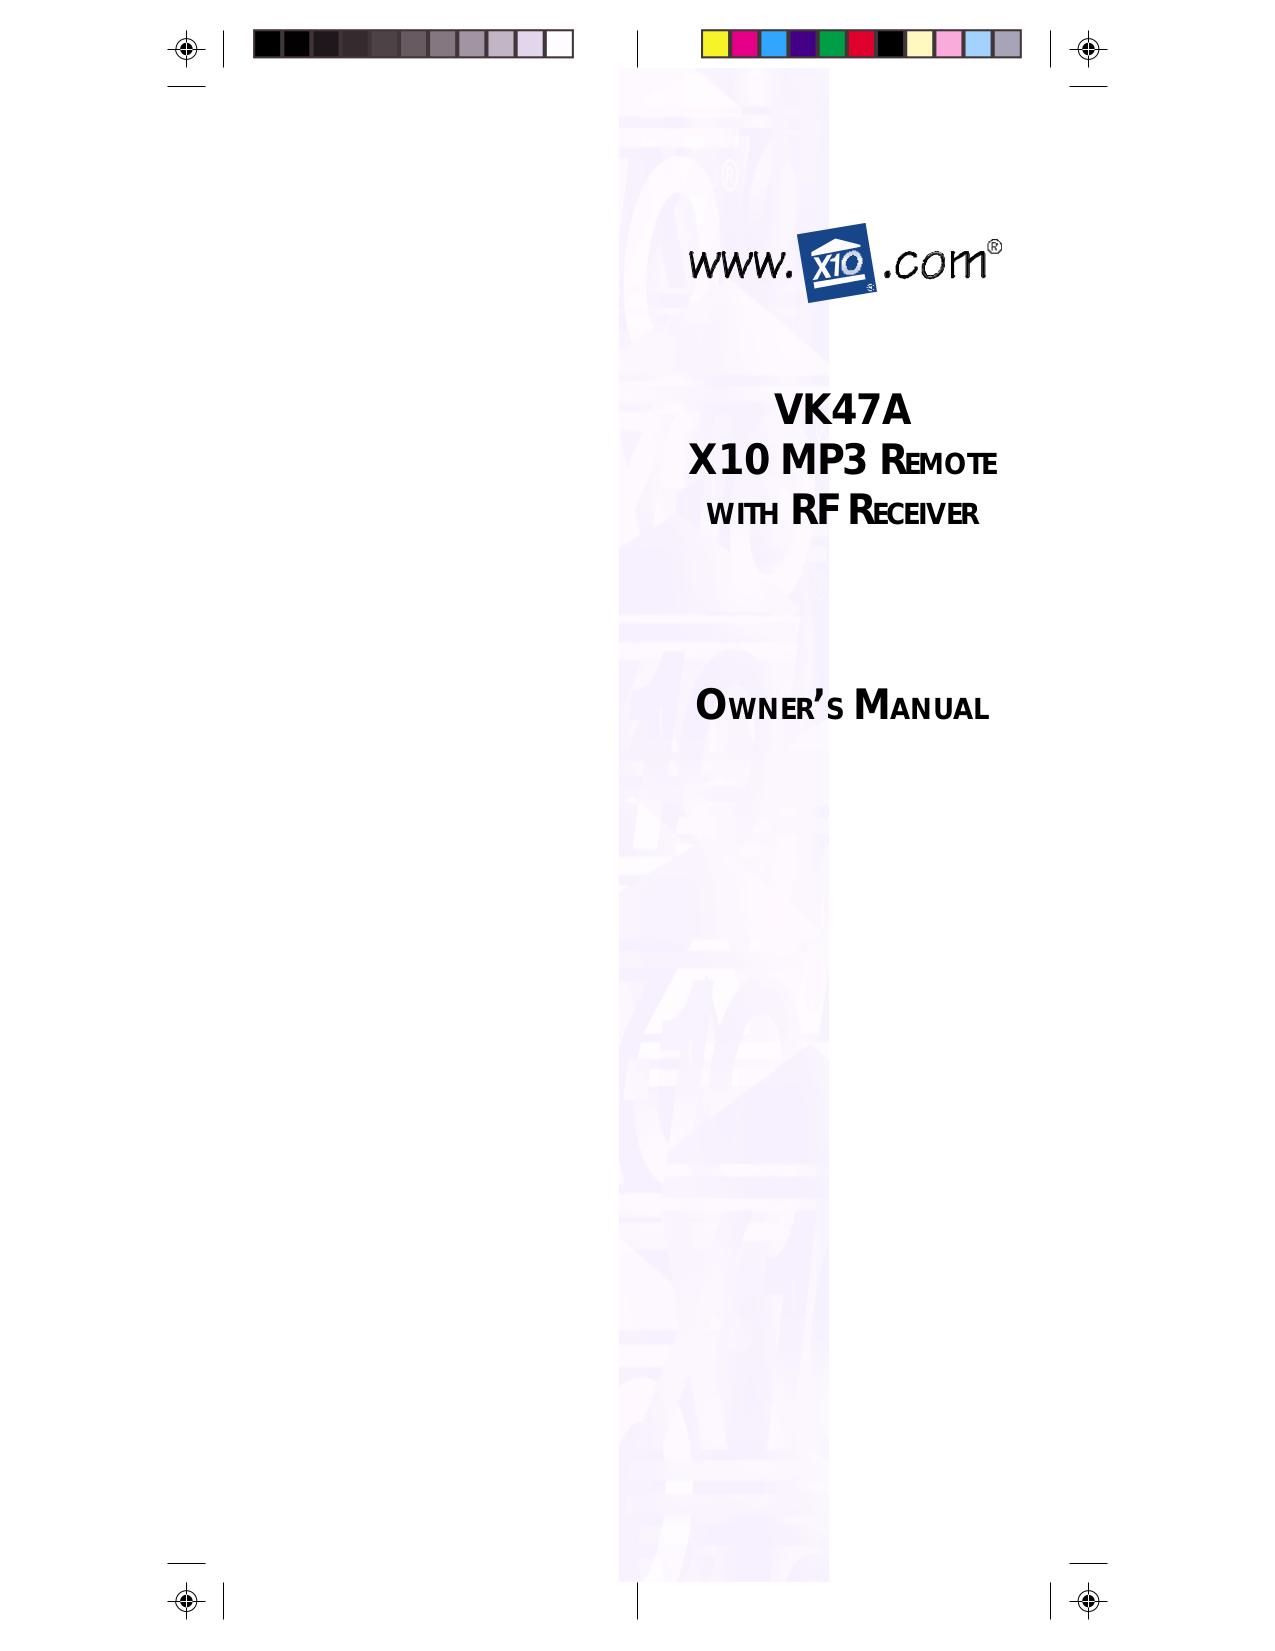 pdf for X10 Remote Control VK47A manual